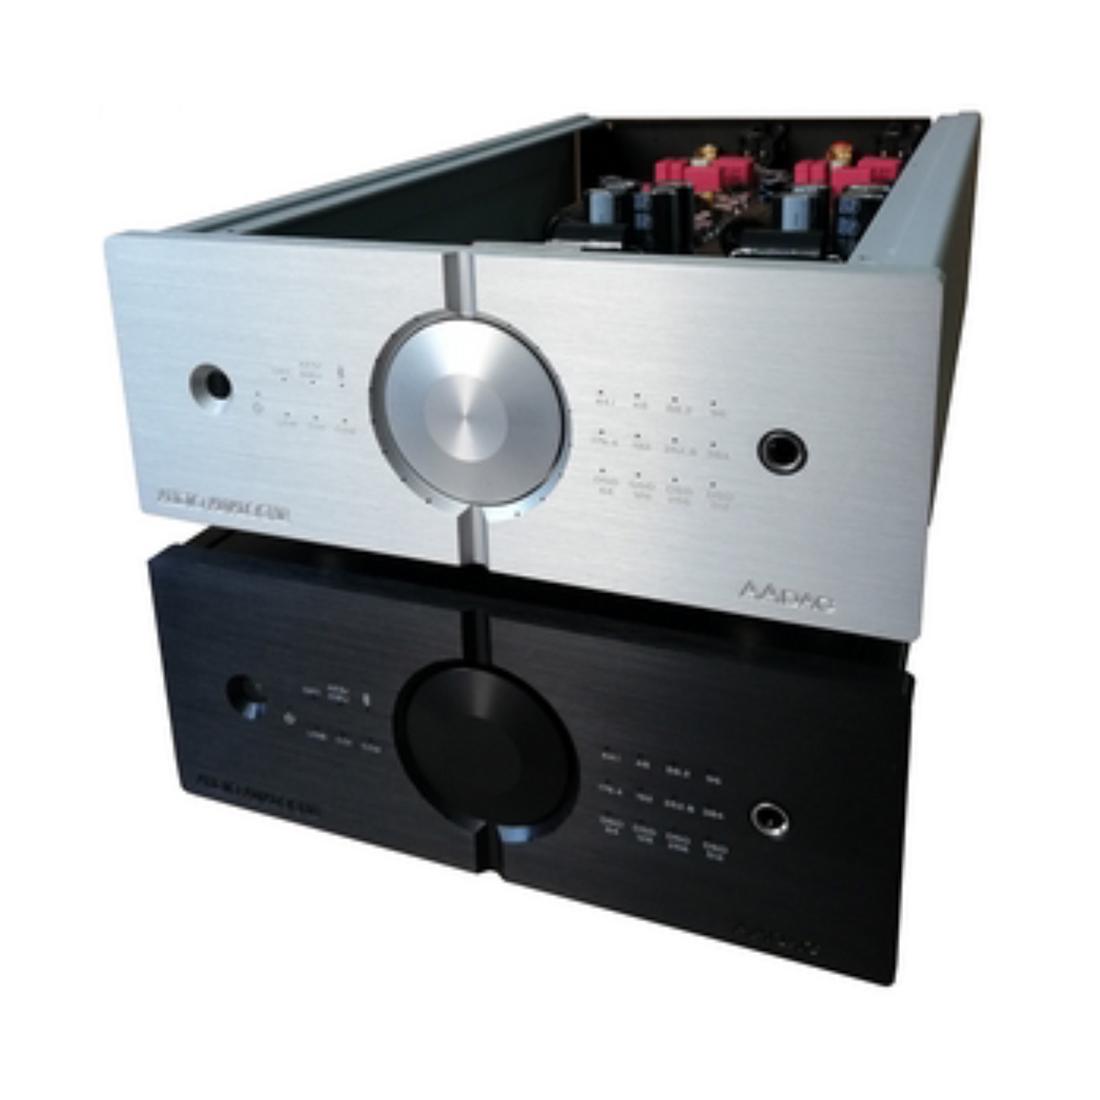 Audio Analogue AAdac